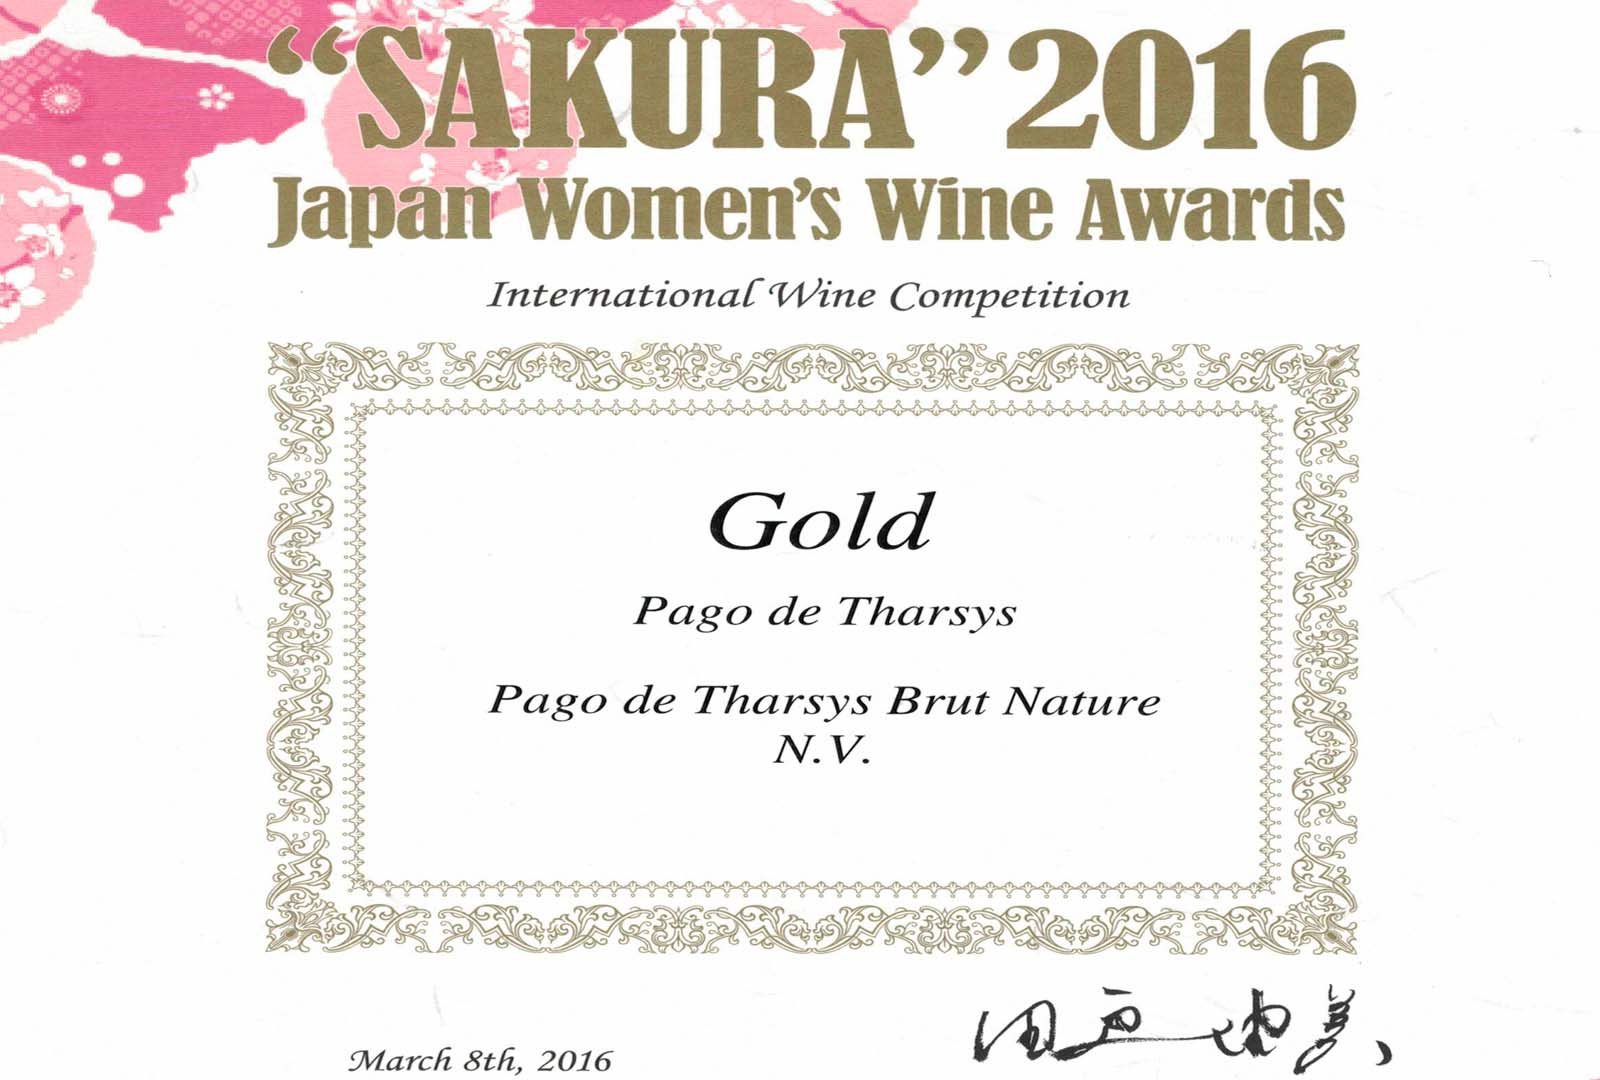 Pago de Tharsys Brut Nature medalla de Oro.